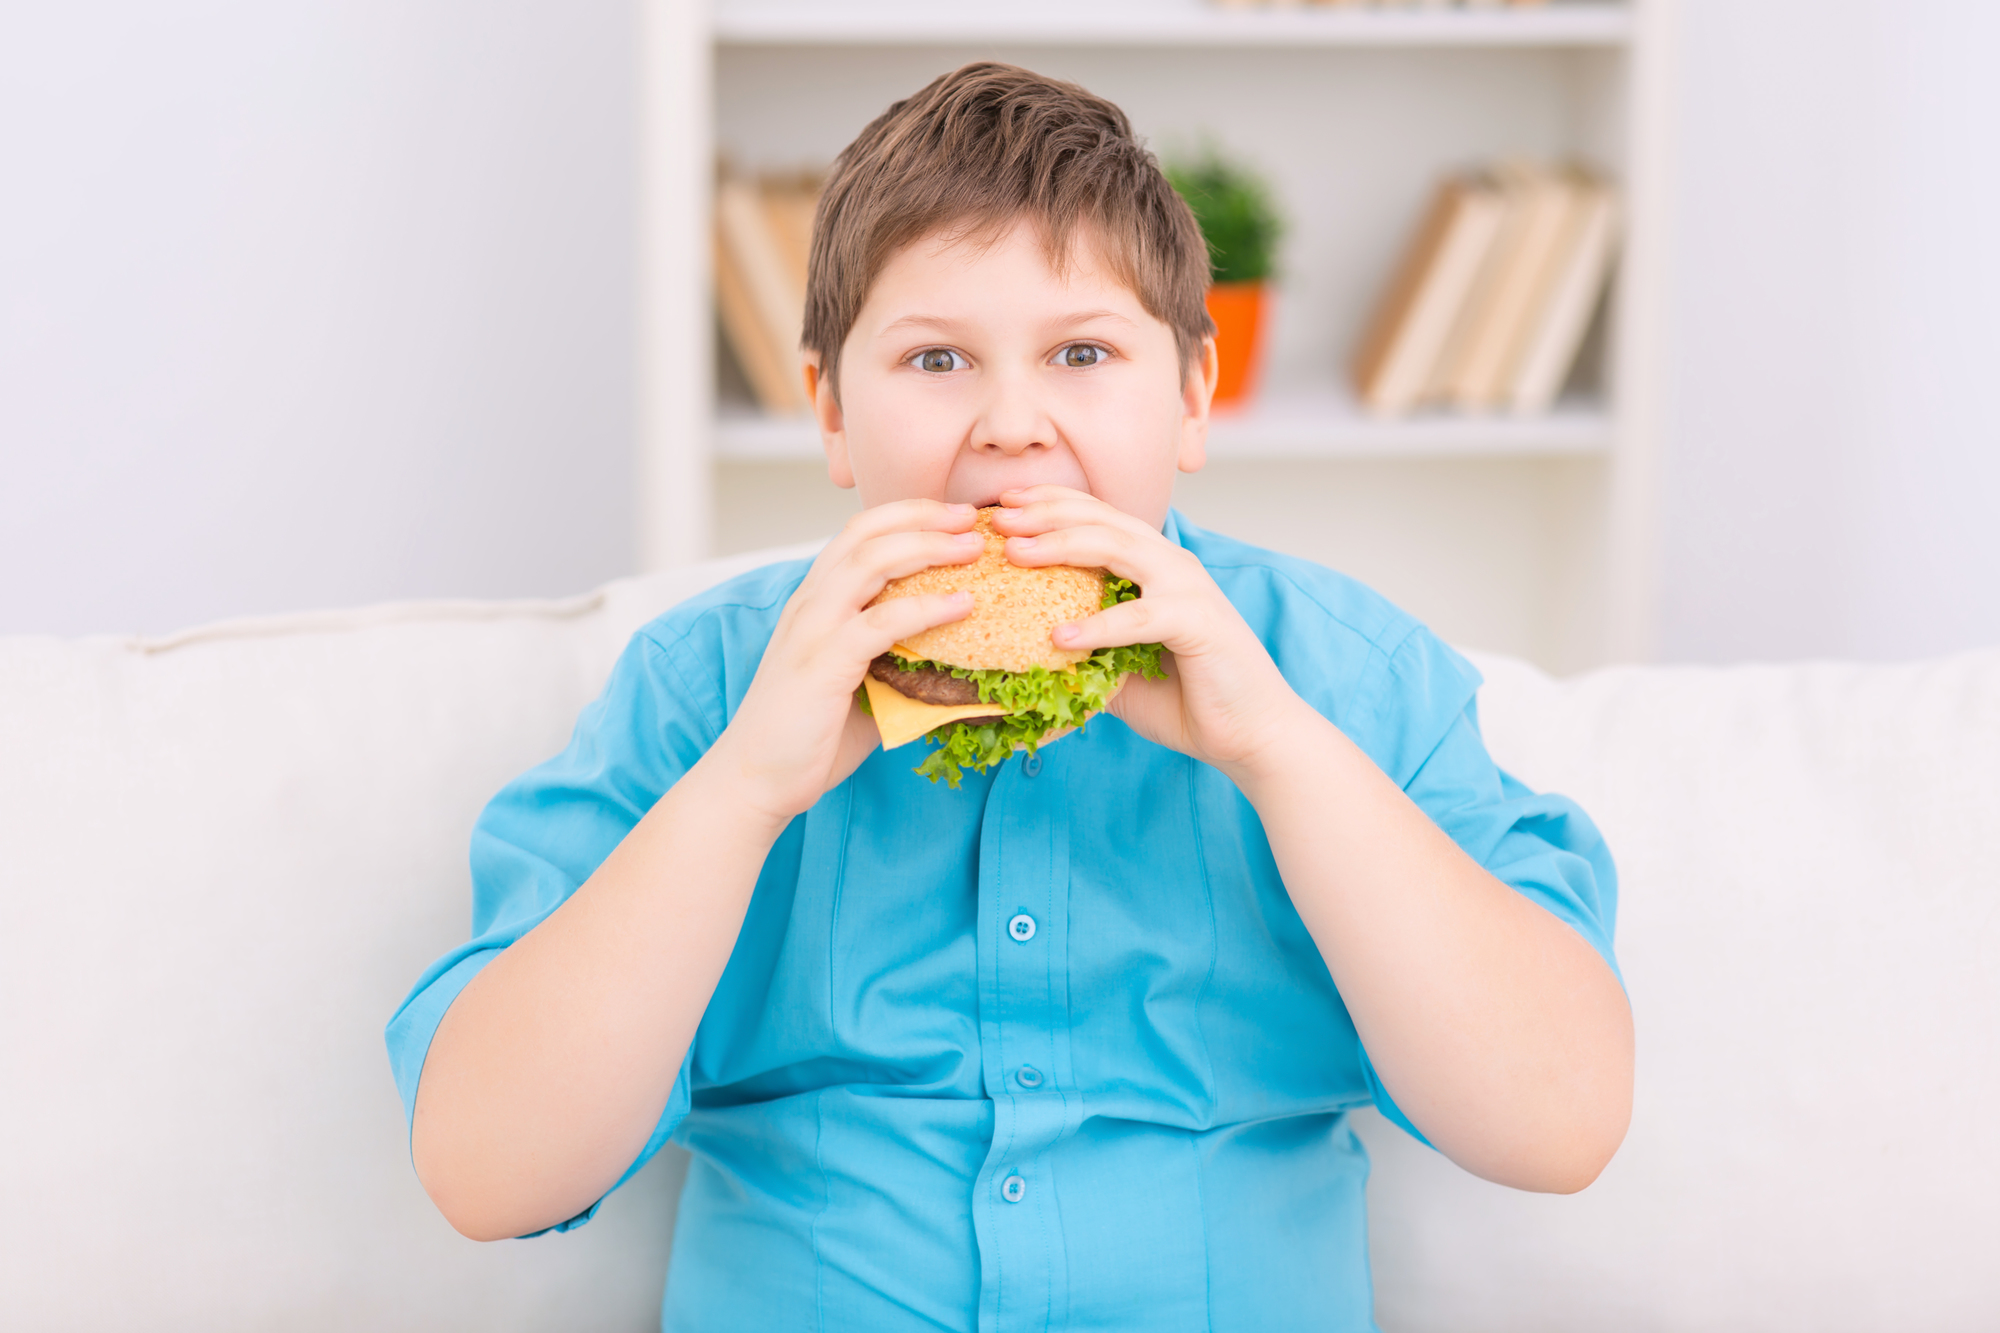 Huge cheeseburger. Chubby boy is taking a big bite off huge burger.